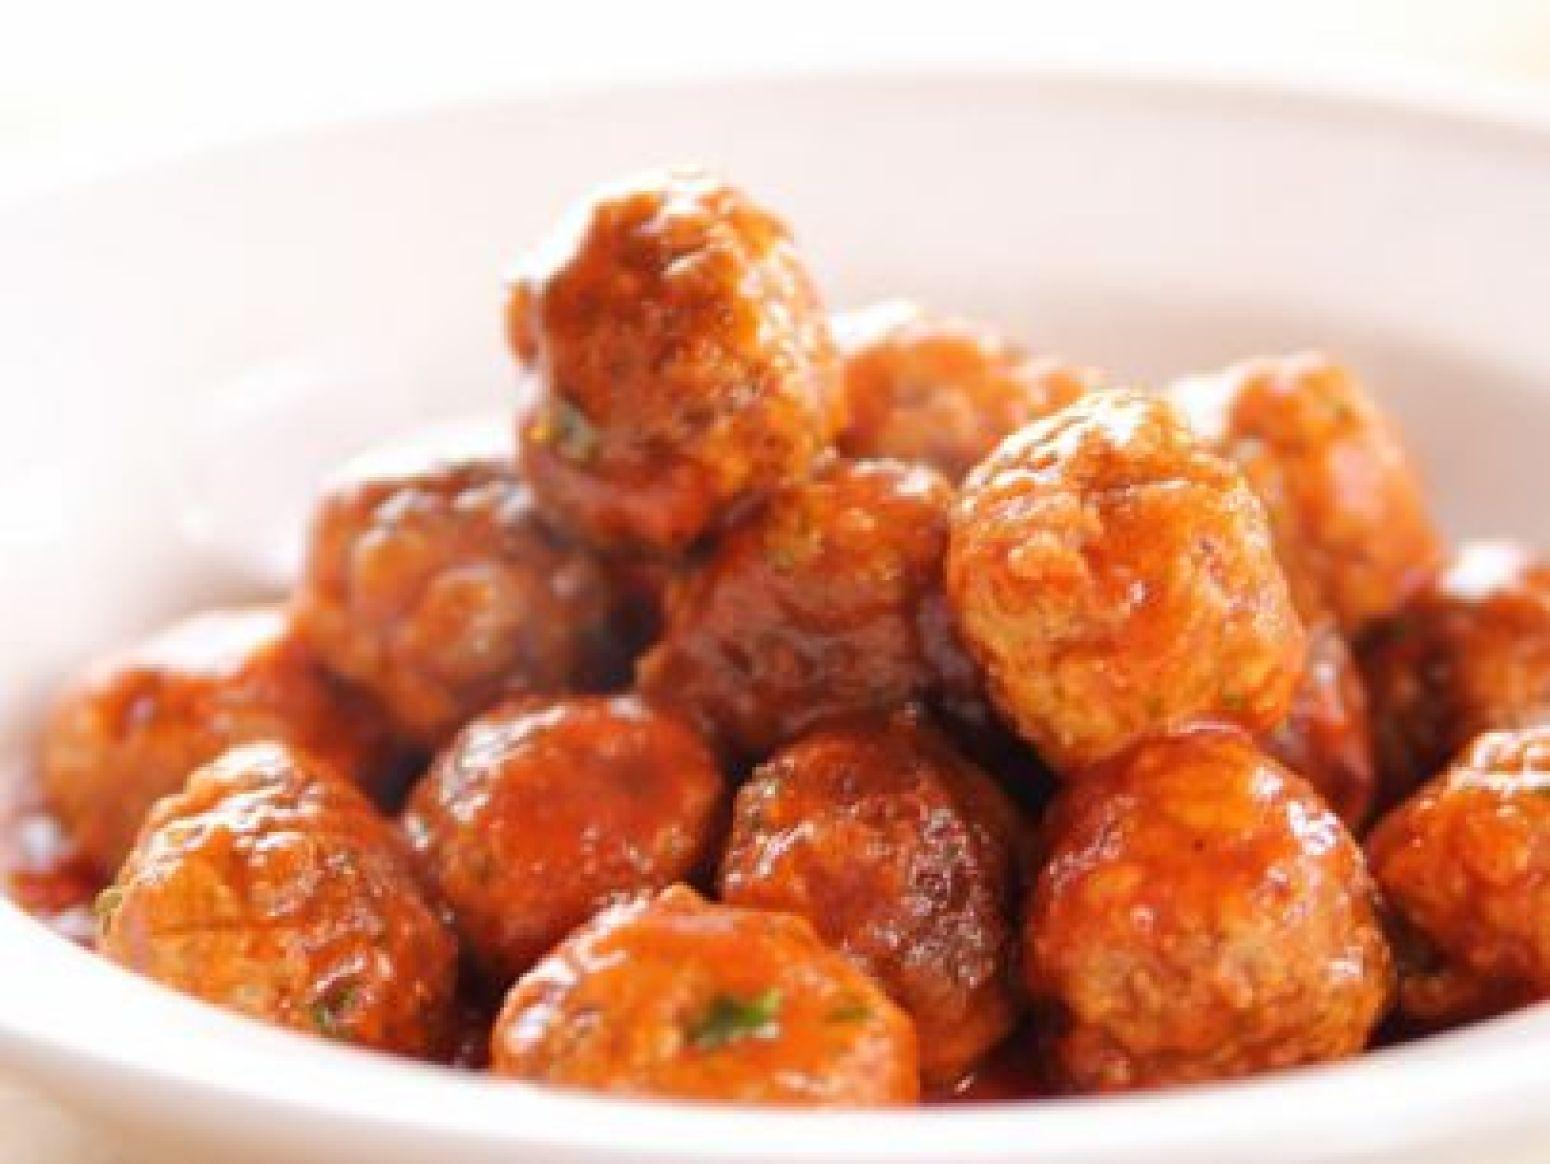 Spicy Italian Meatballs Recipe 2 | Just A Pinch Recipes